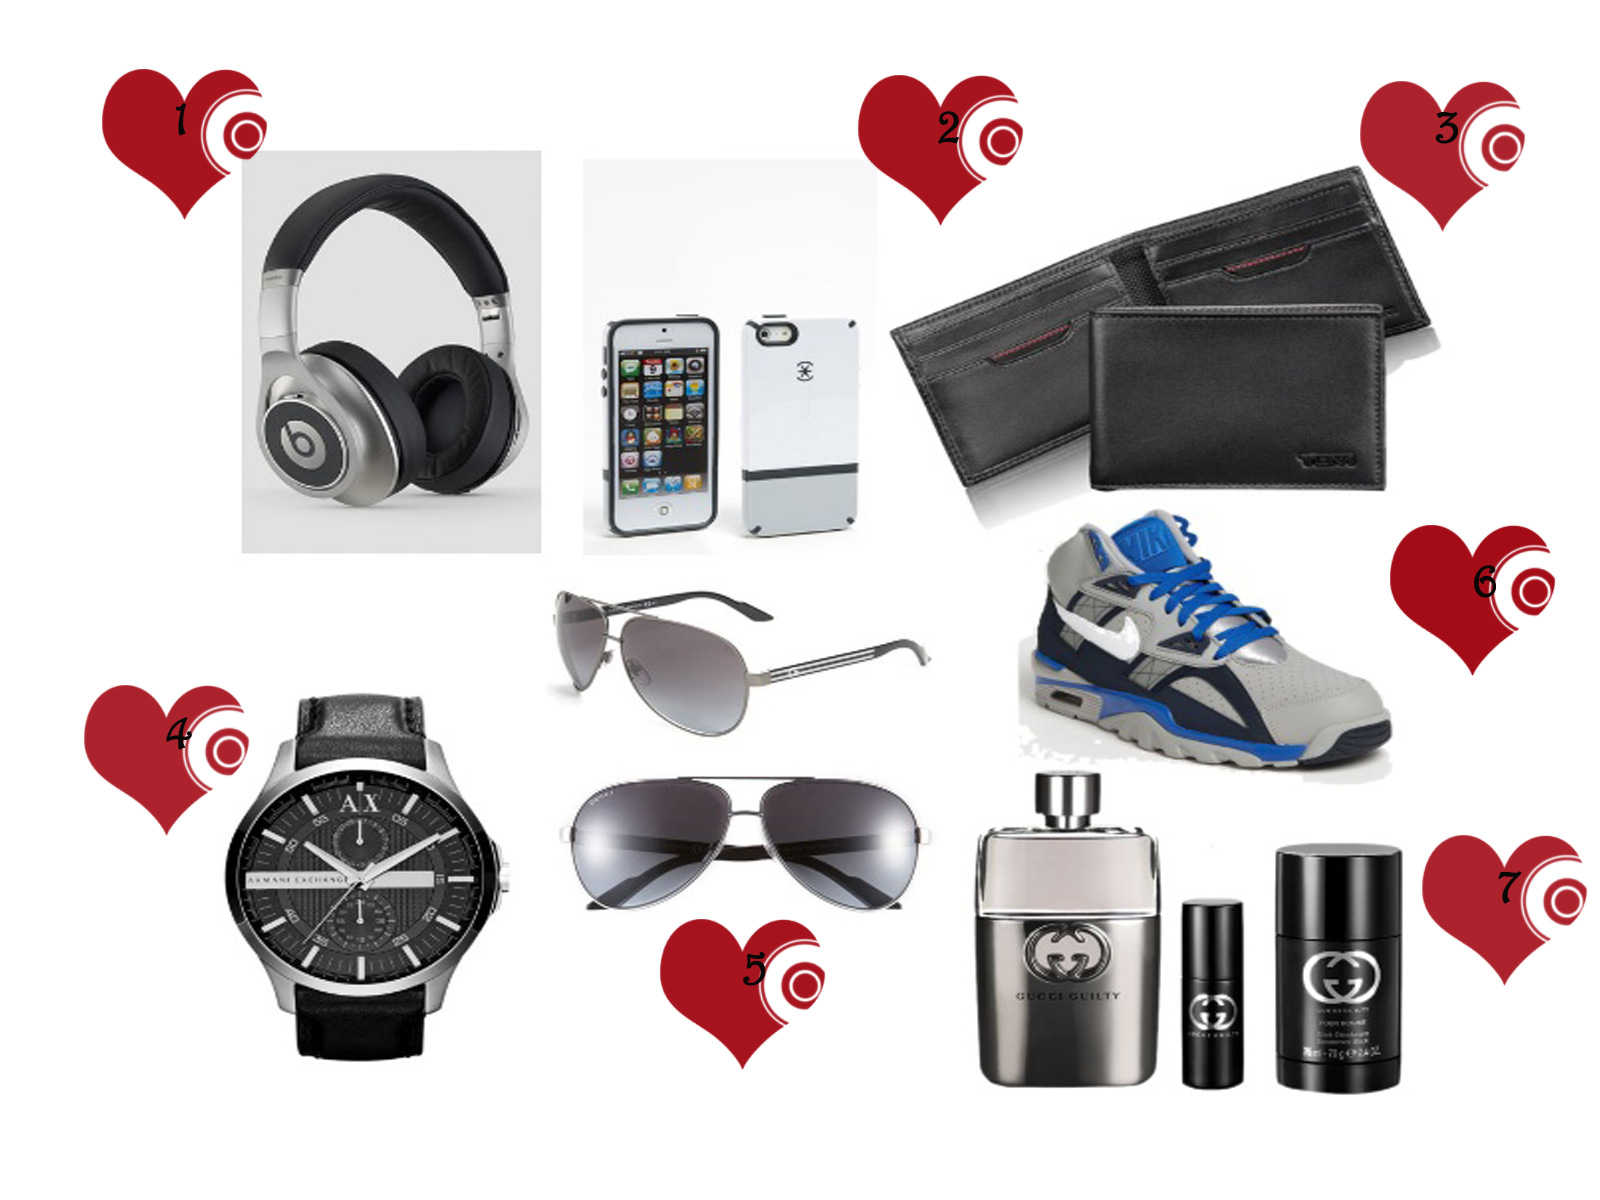 Happy Valentineu0027s Day 2015 Gift for Him (Boyfriend-Husband) - Gadgets